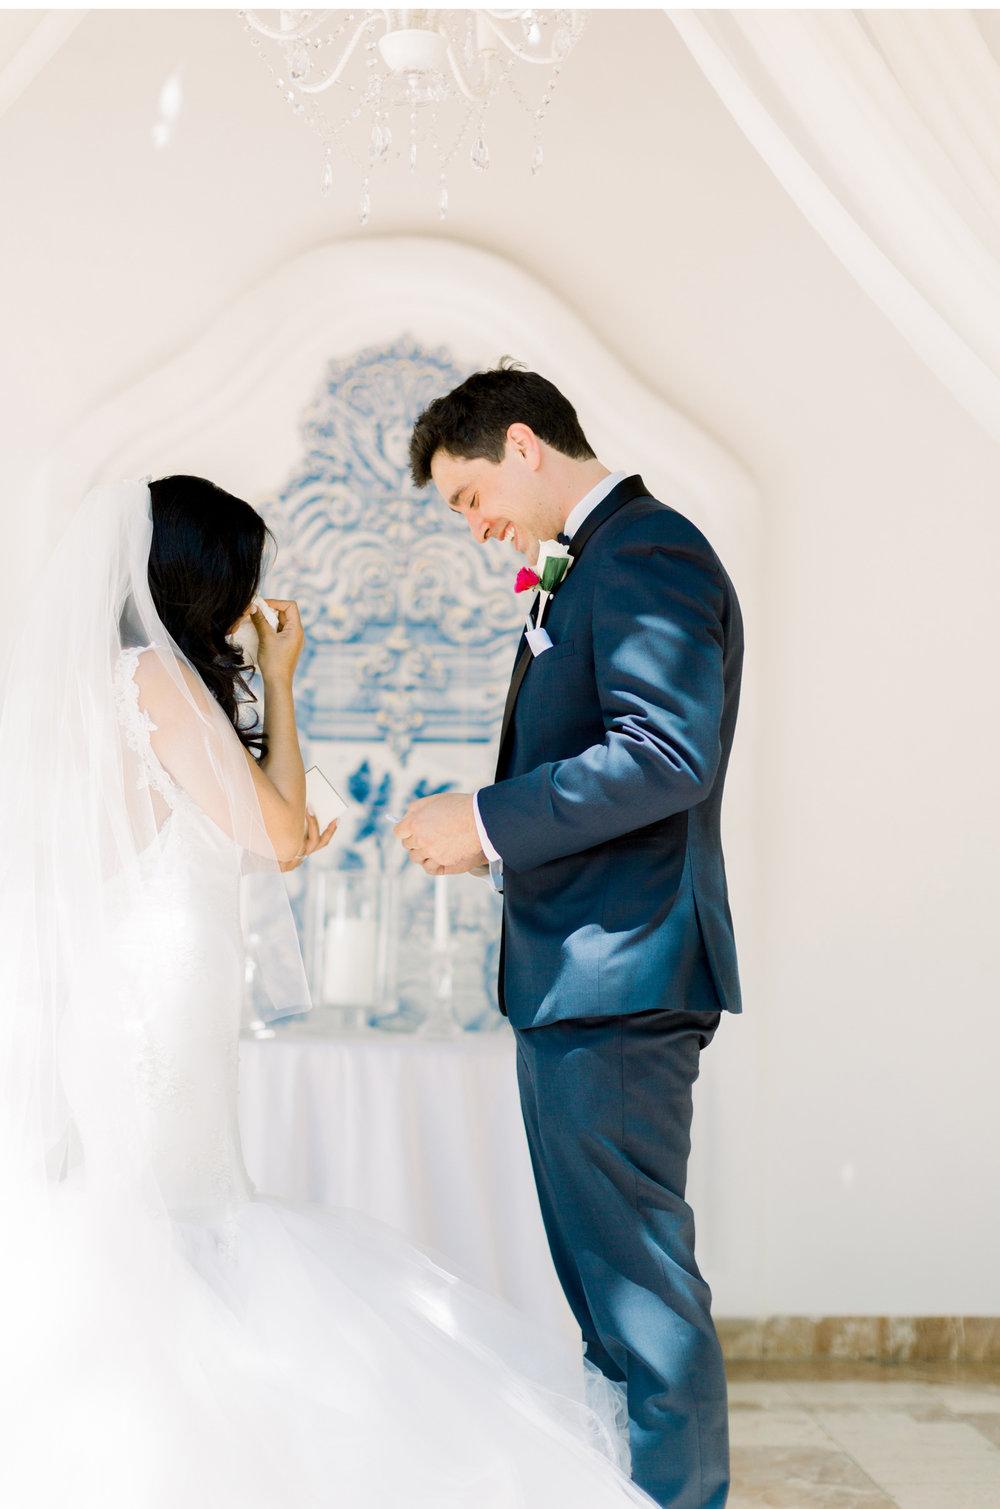 Rancho-Las-Lomas-Style-Me-Pretty-Wedding-Natalie-Schutt-Photography_07.jpg